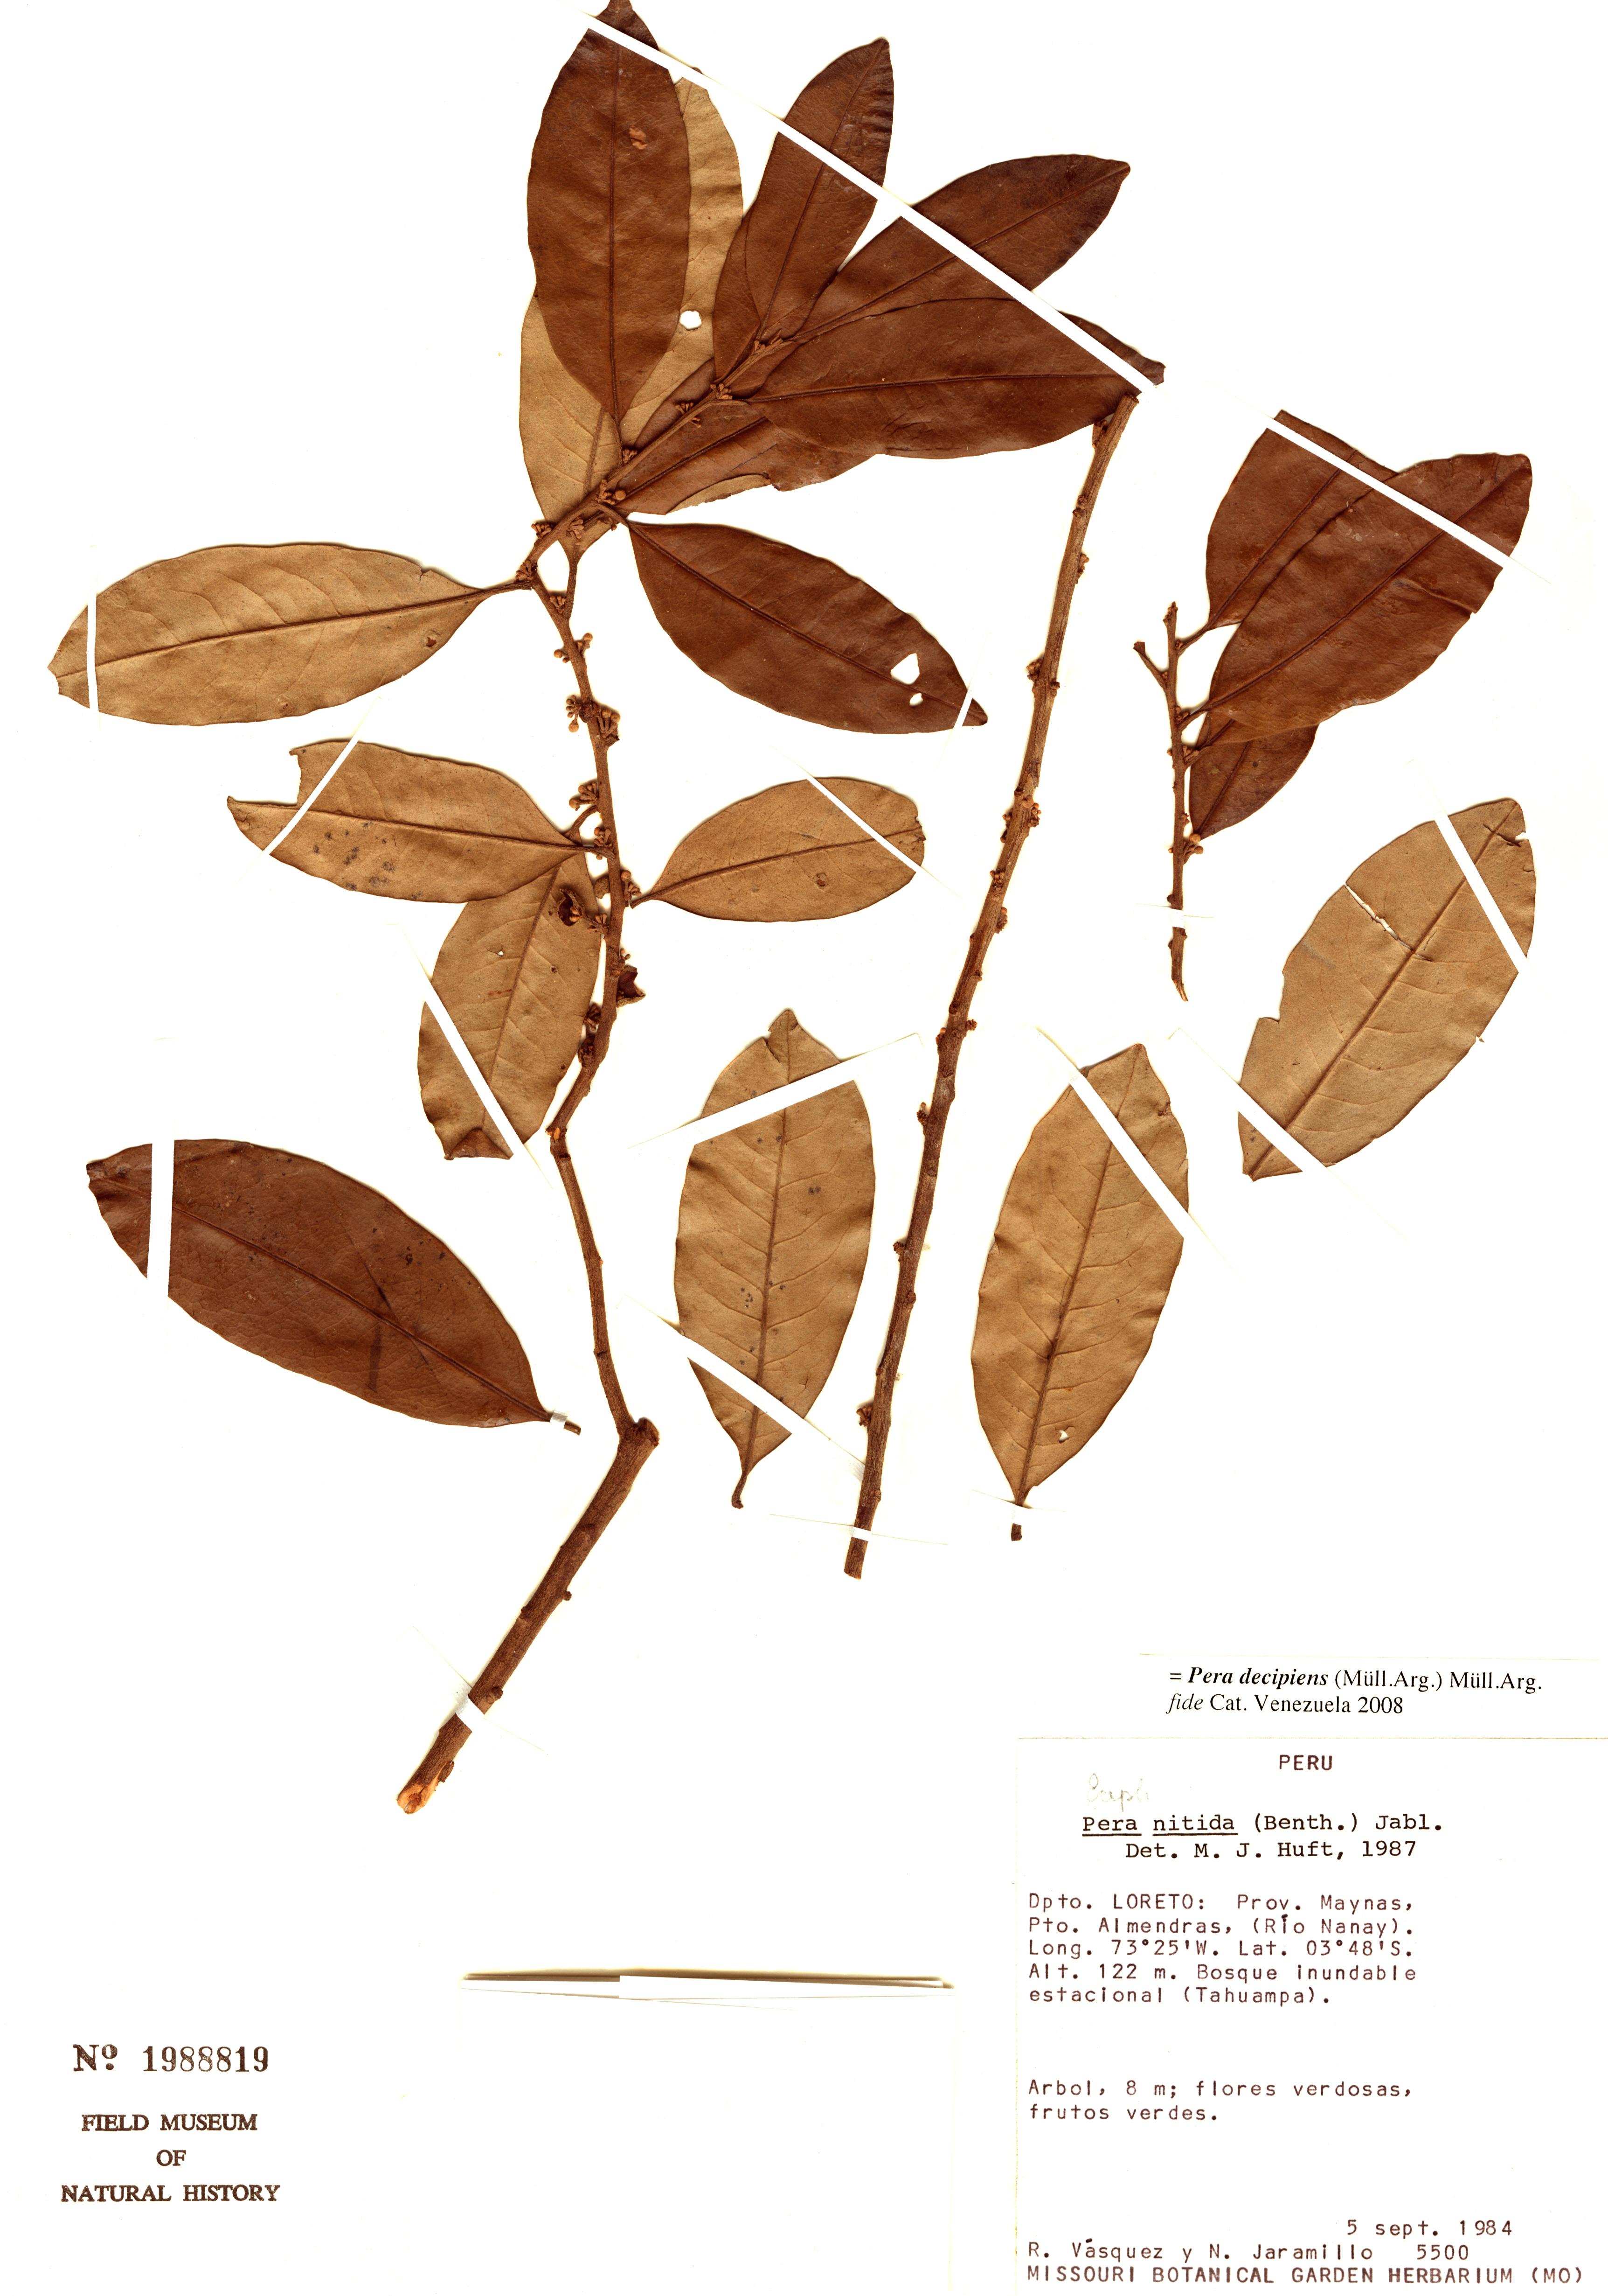 Espécimen: Pera decipiens